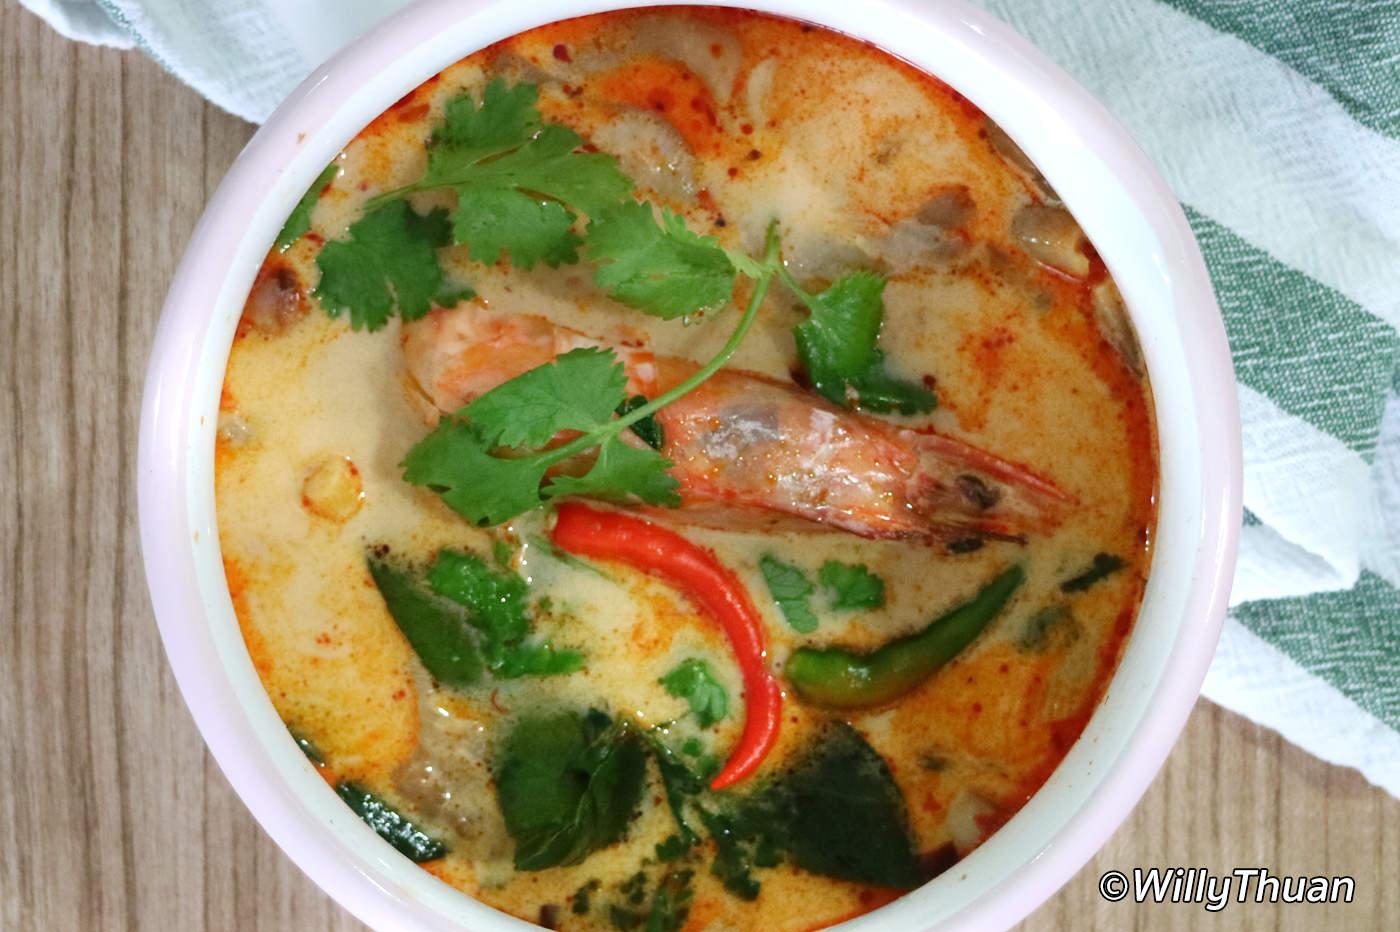 Tom Yum Goong Recipe